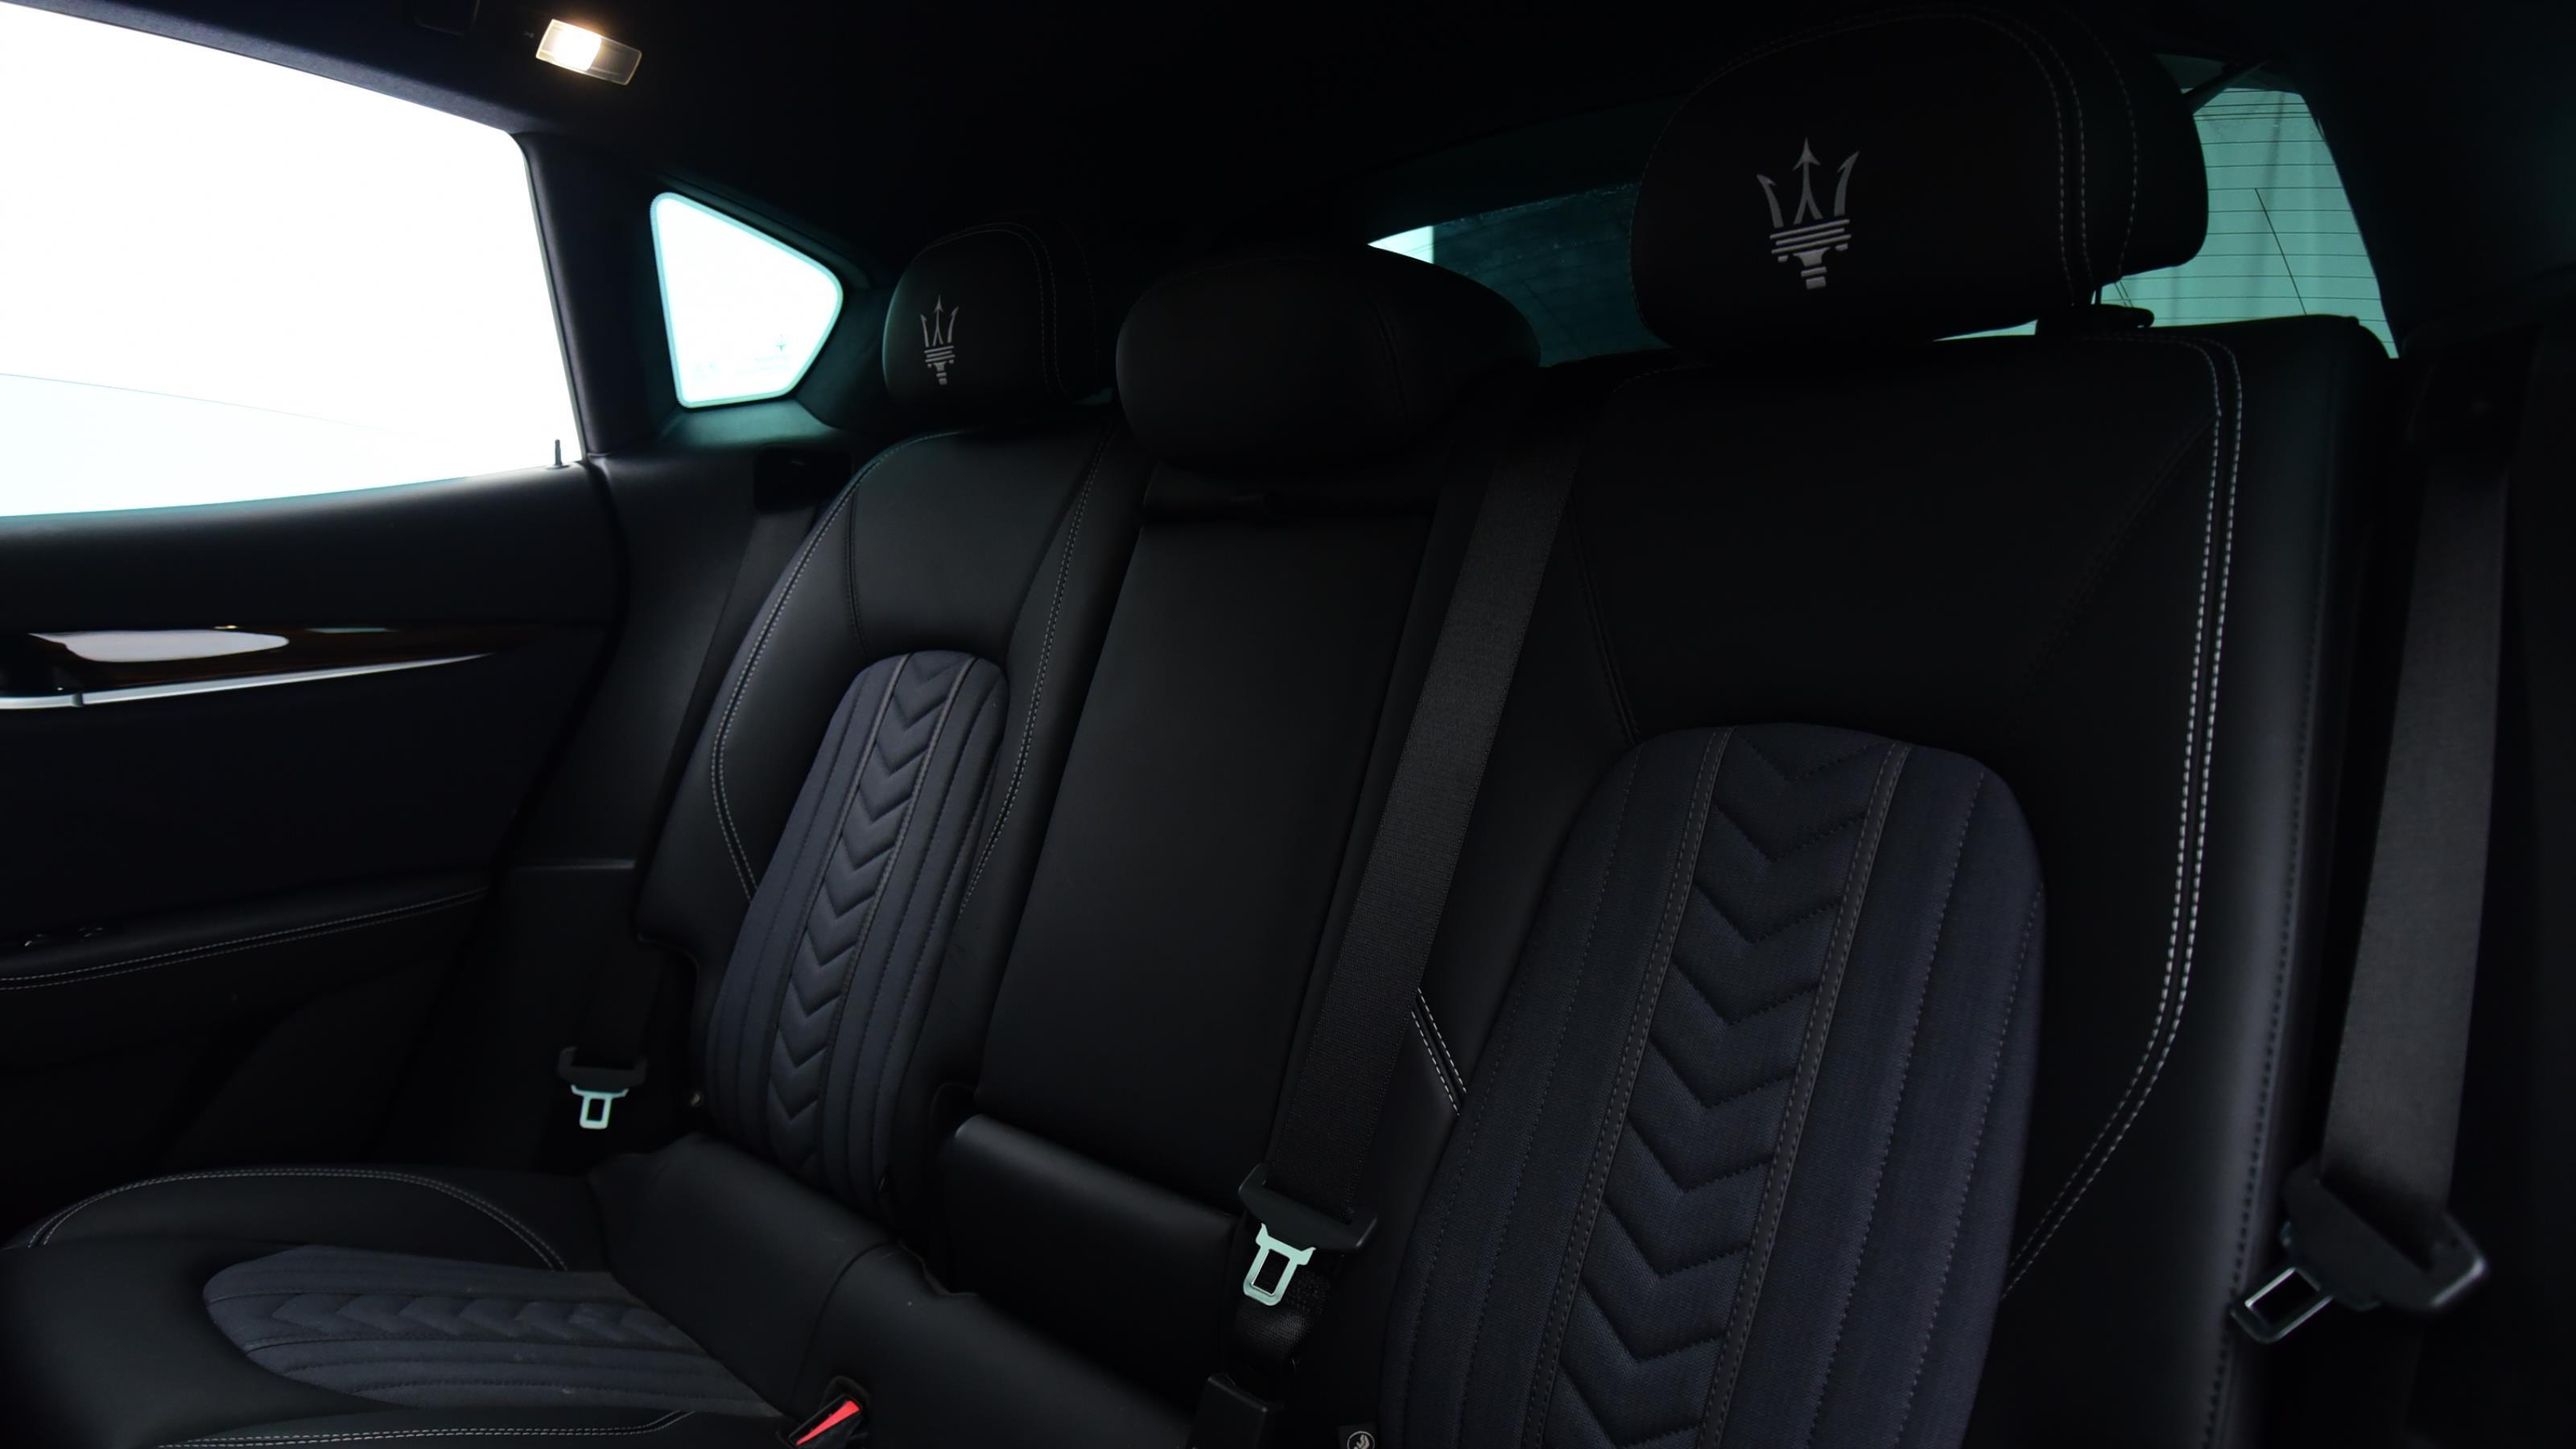 Used 2017 Maserati LEVANTE V6 S 5dr Auto Grey at Saxton4x4